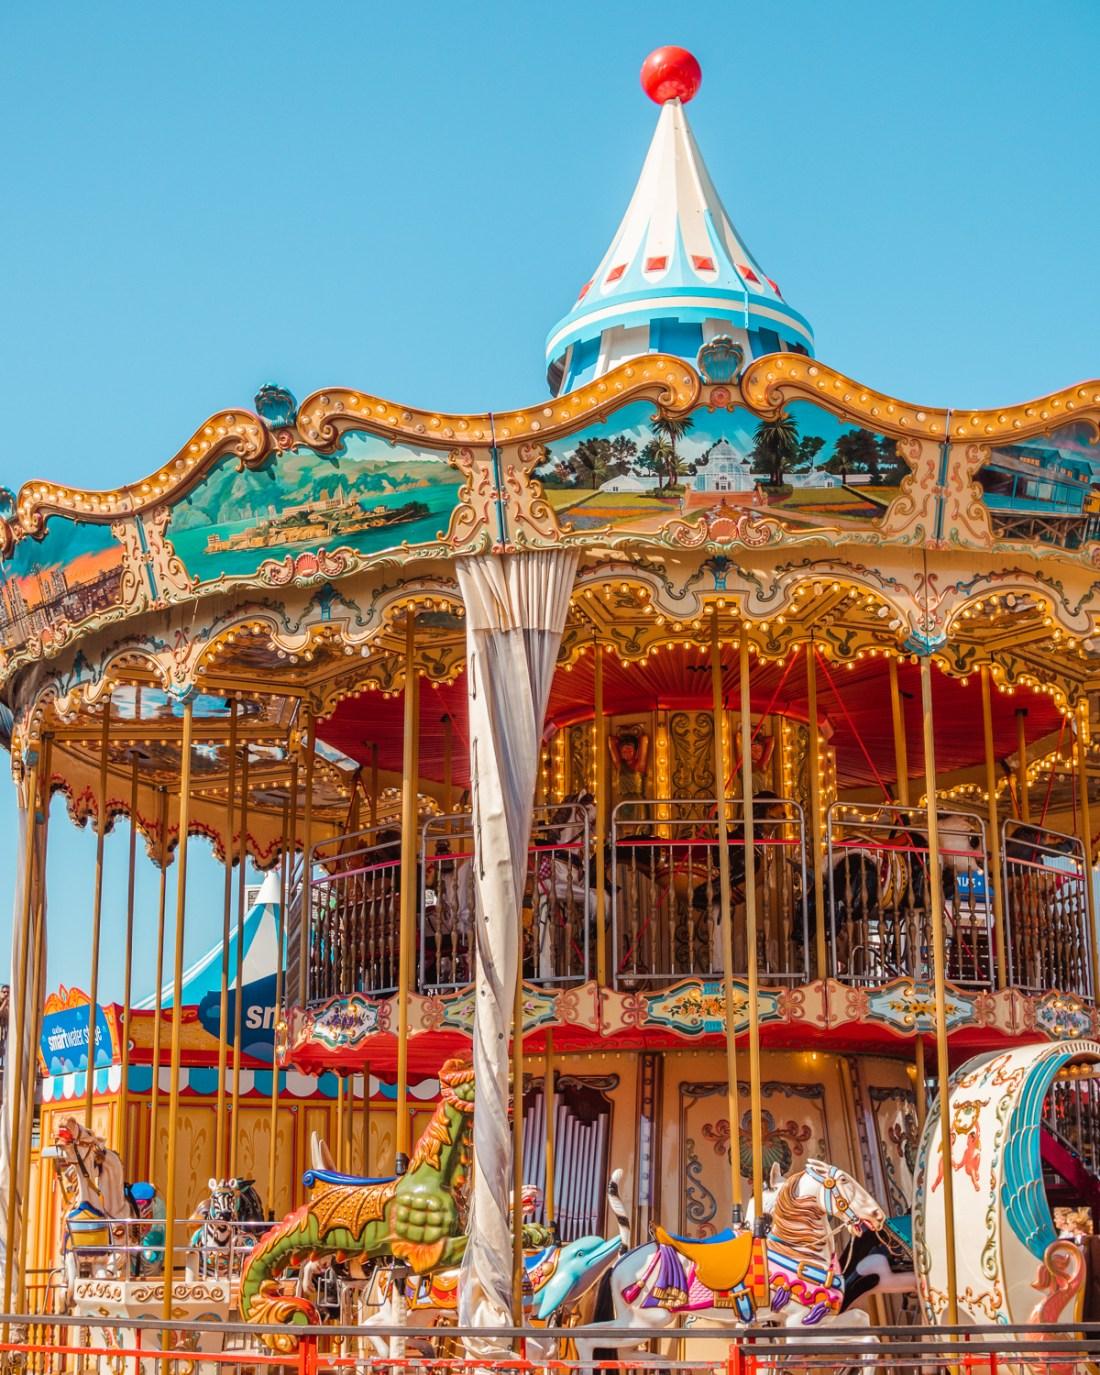 carousel at Pier 39 in San Francisco